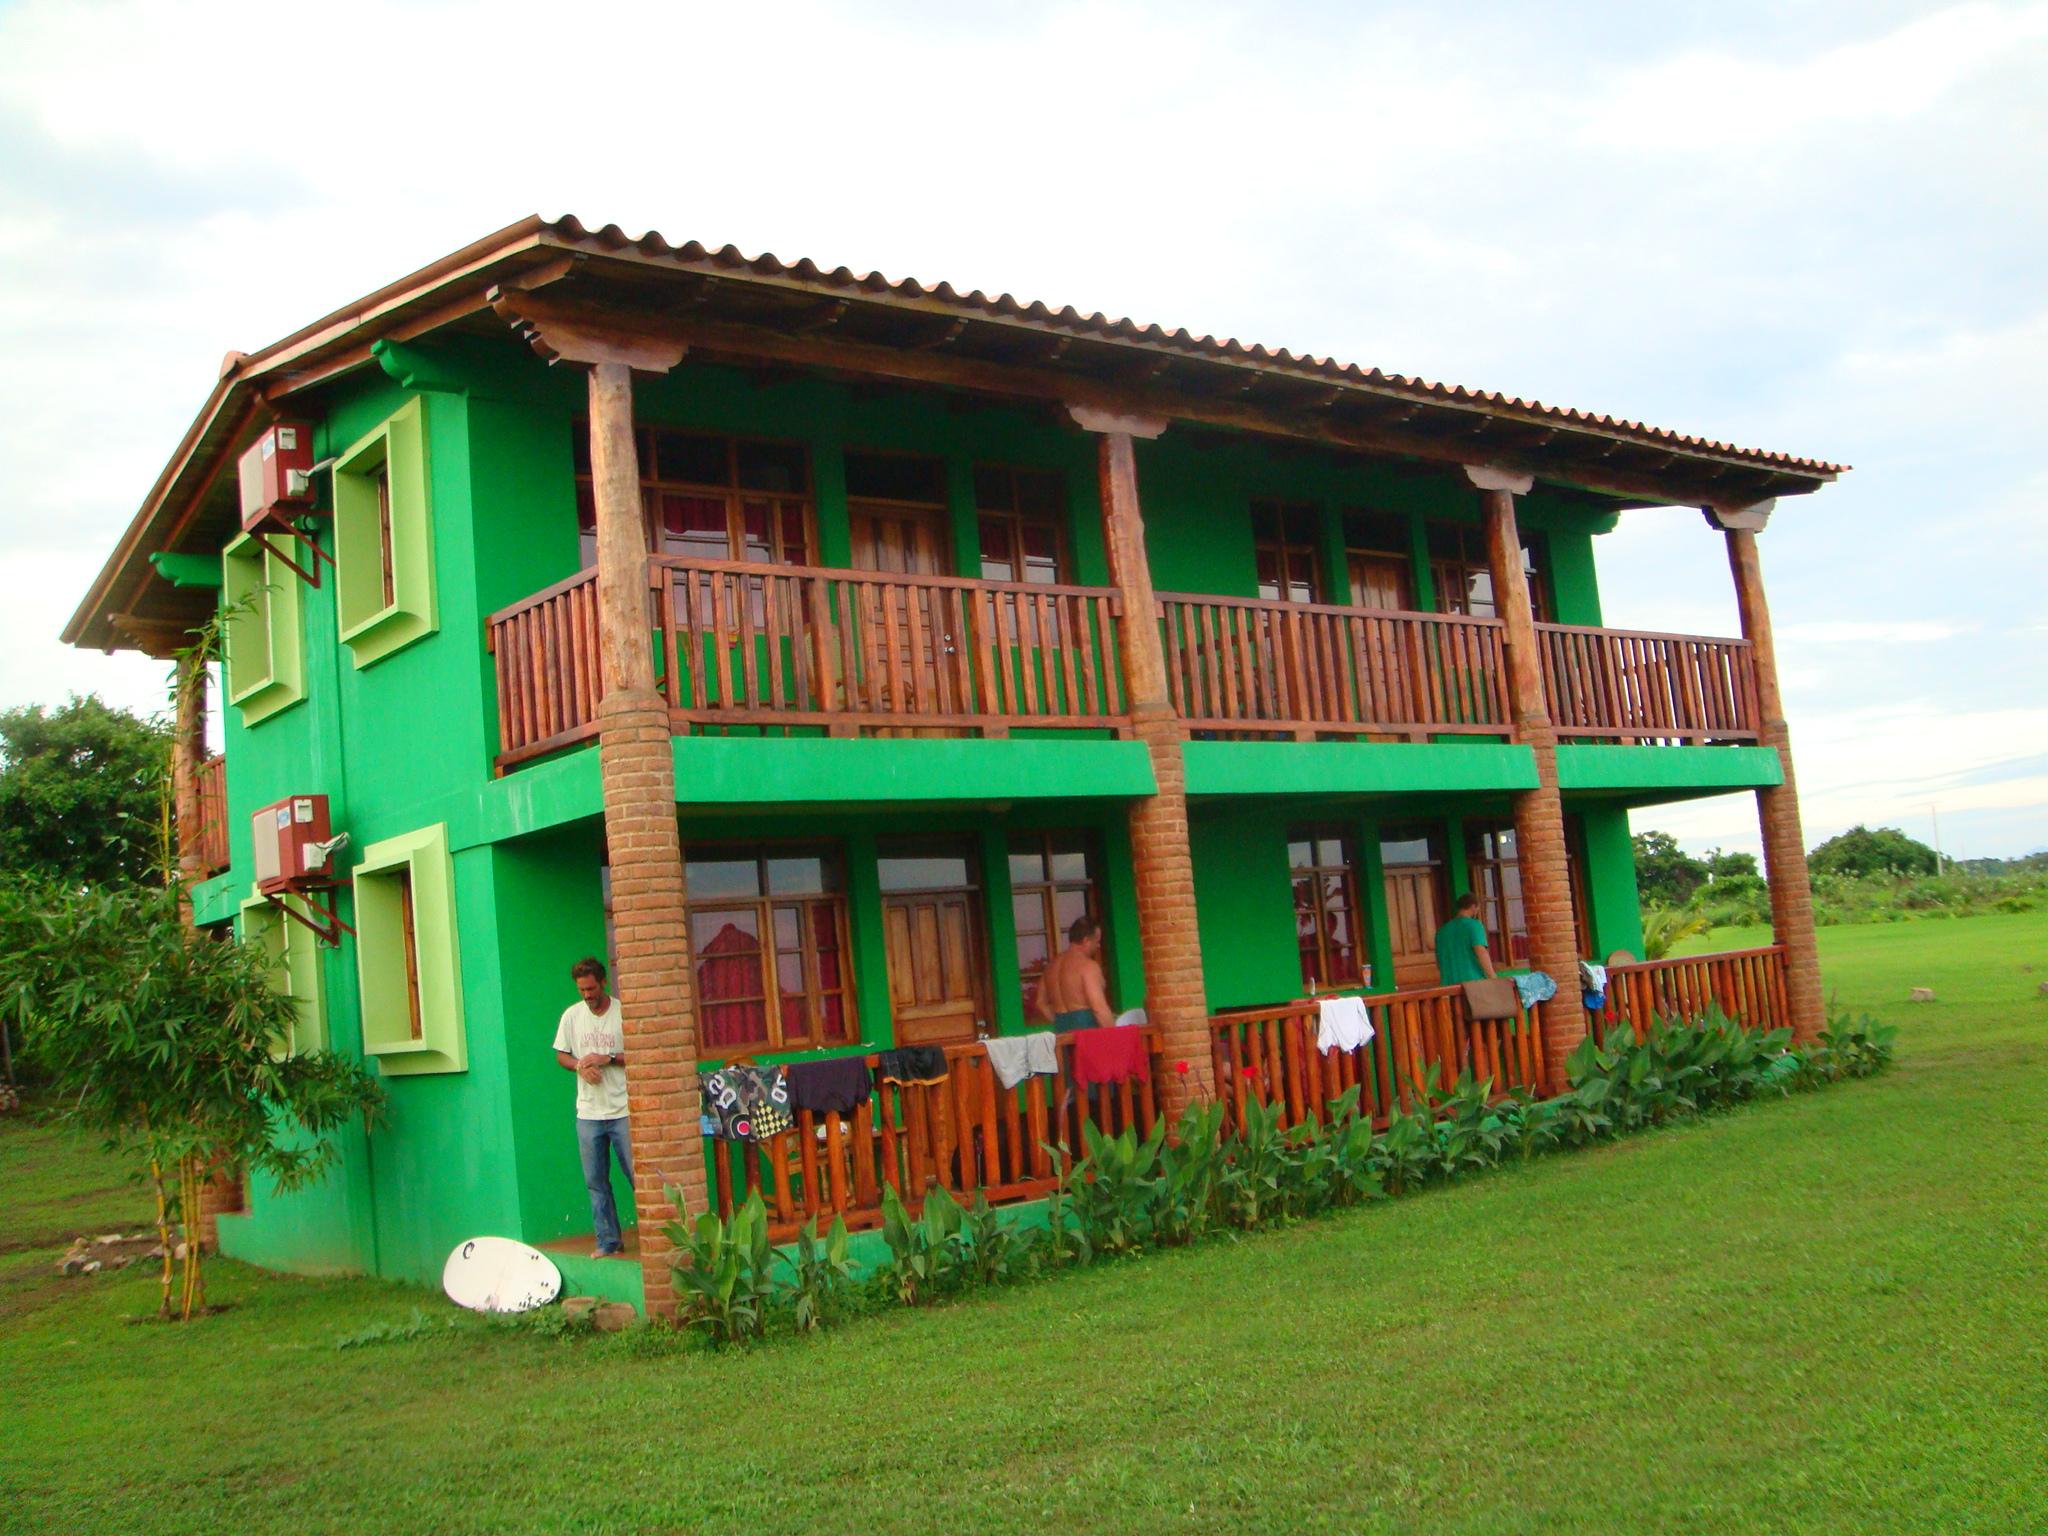 Hotel Chancletas